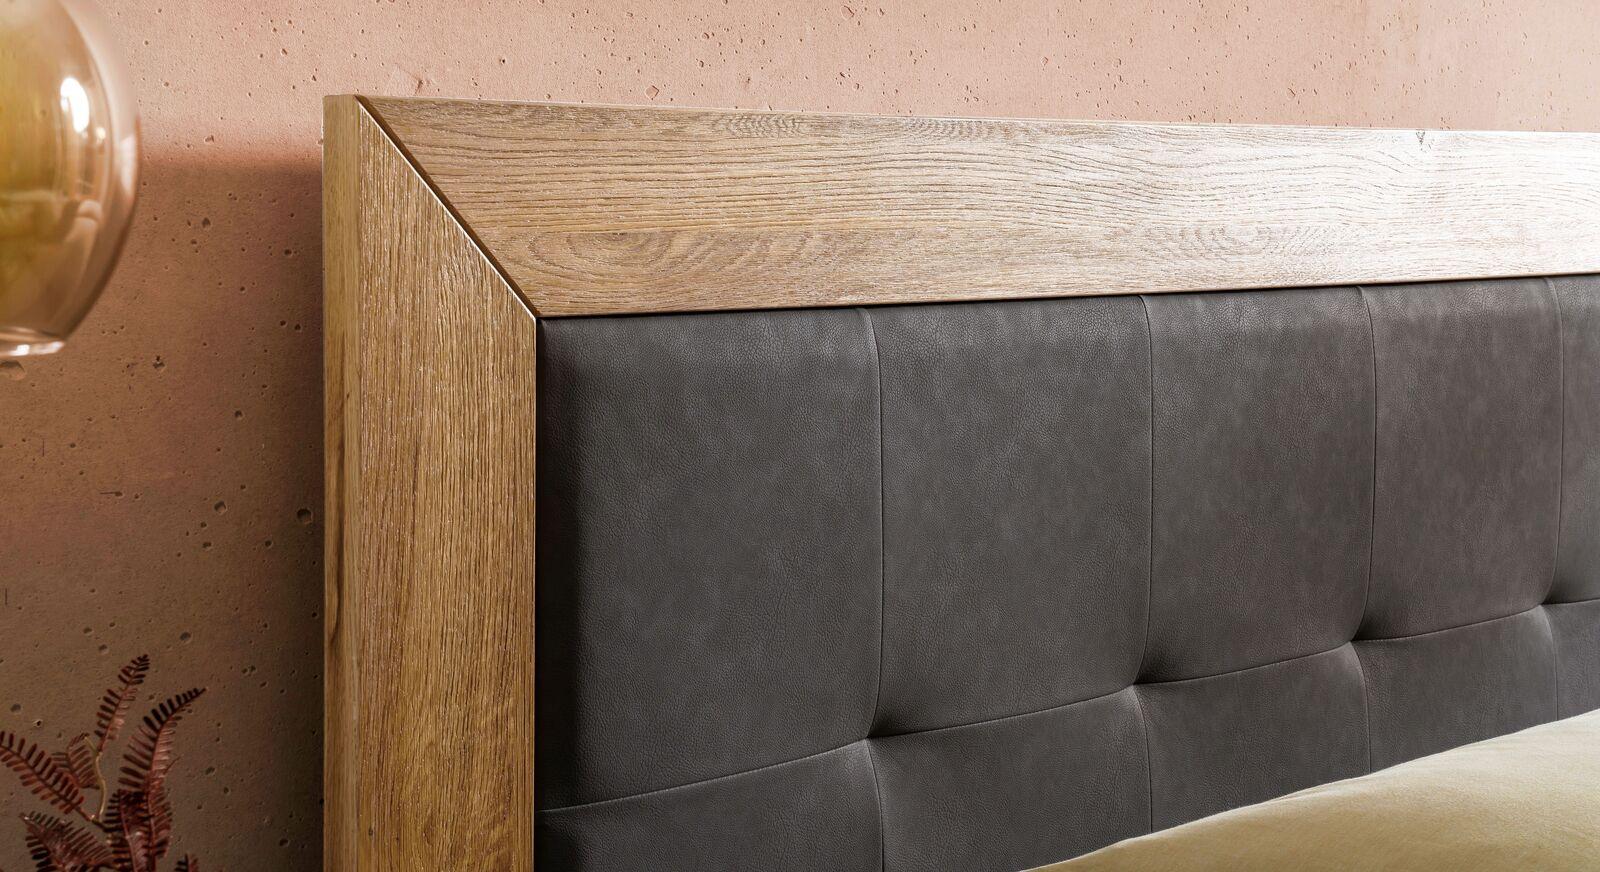 Boxspringbett Solberg mit Rahmen aus Wildeichenholz